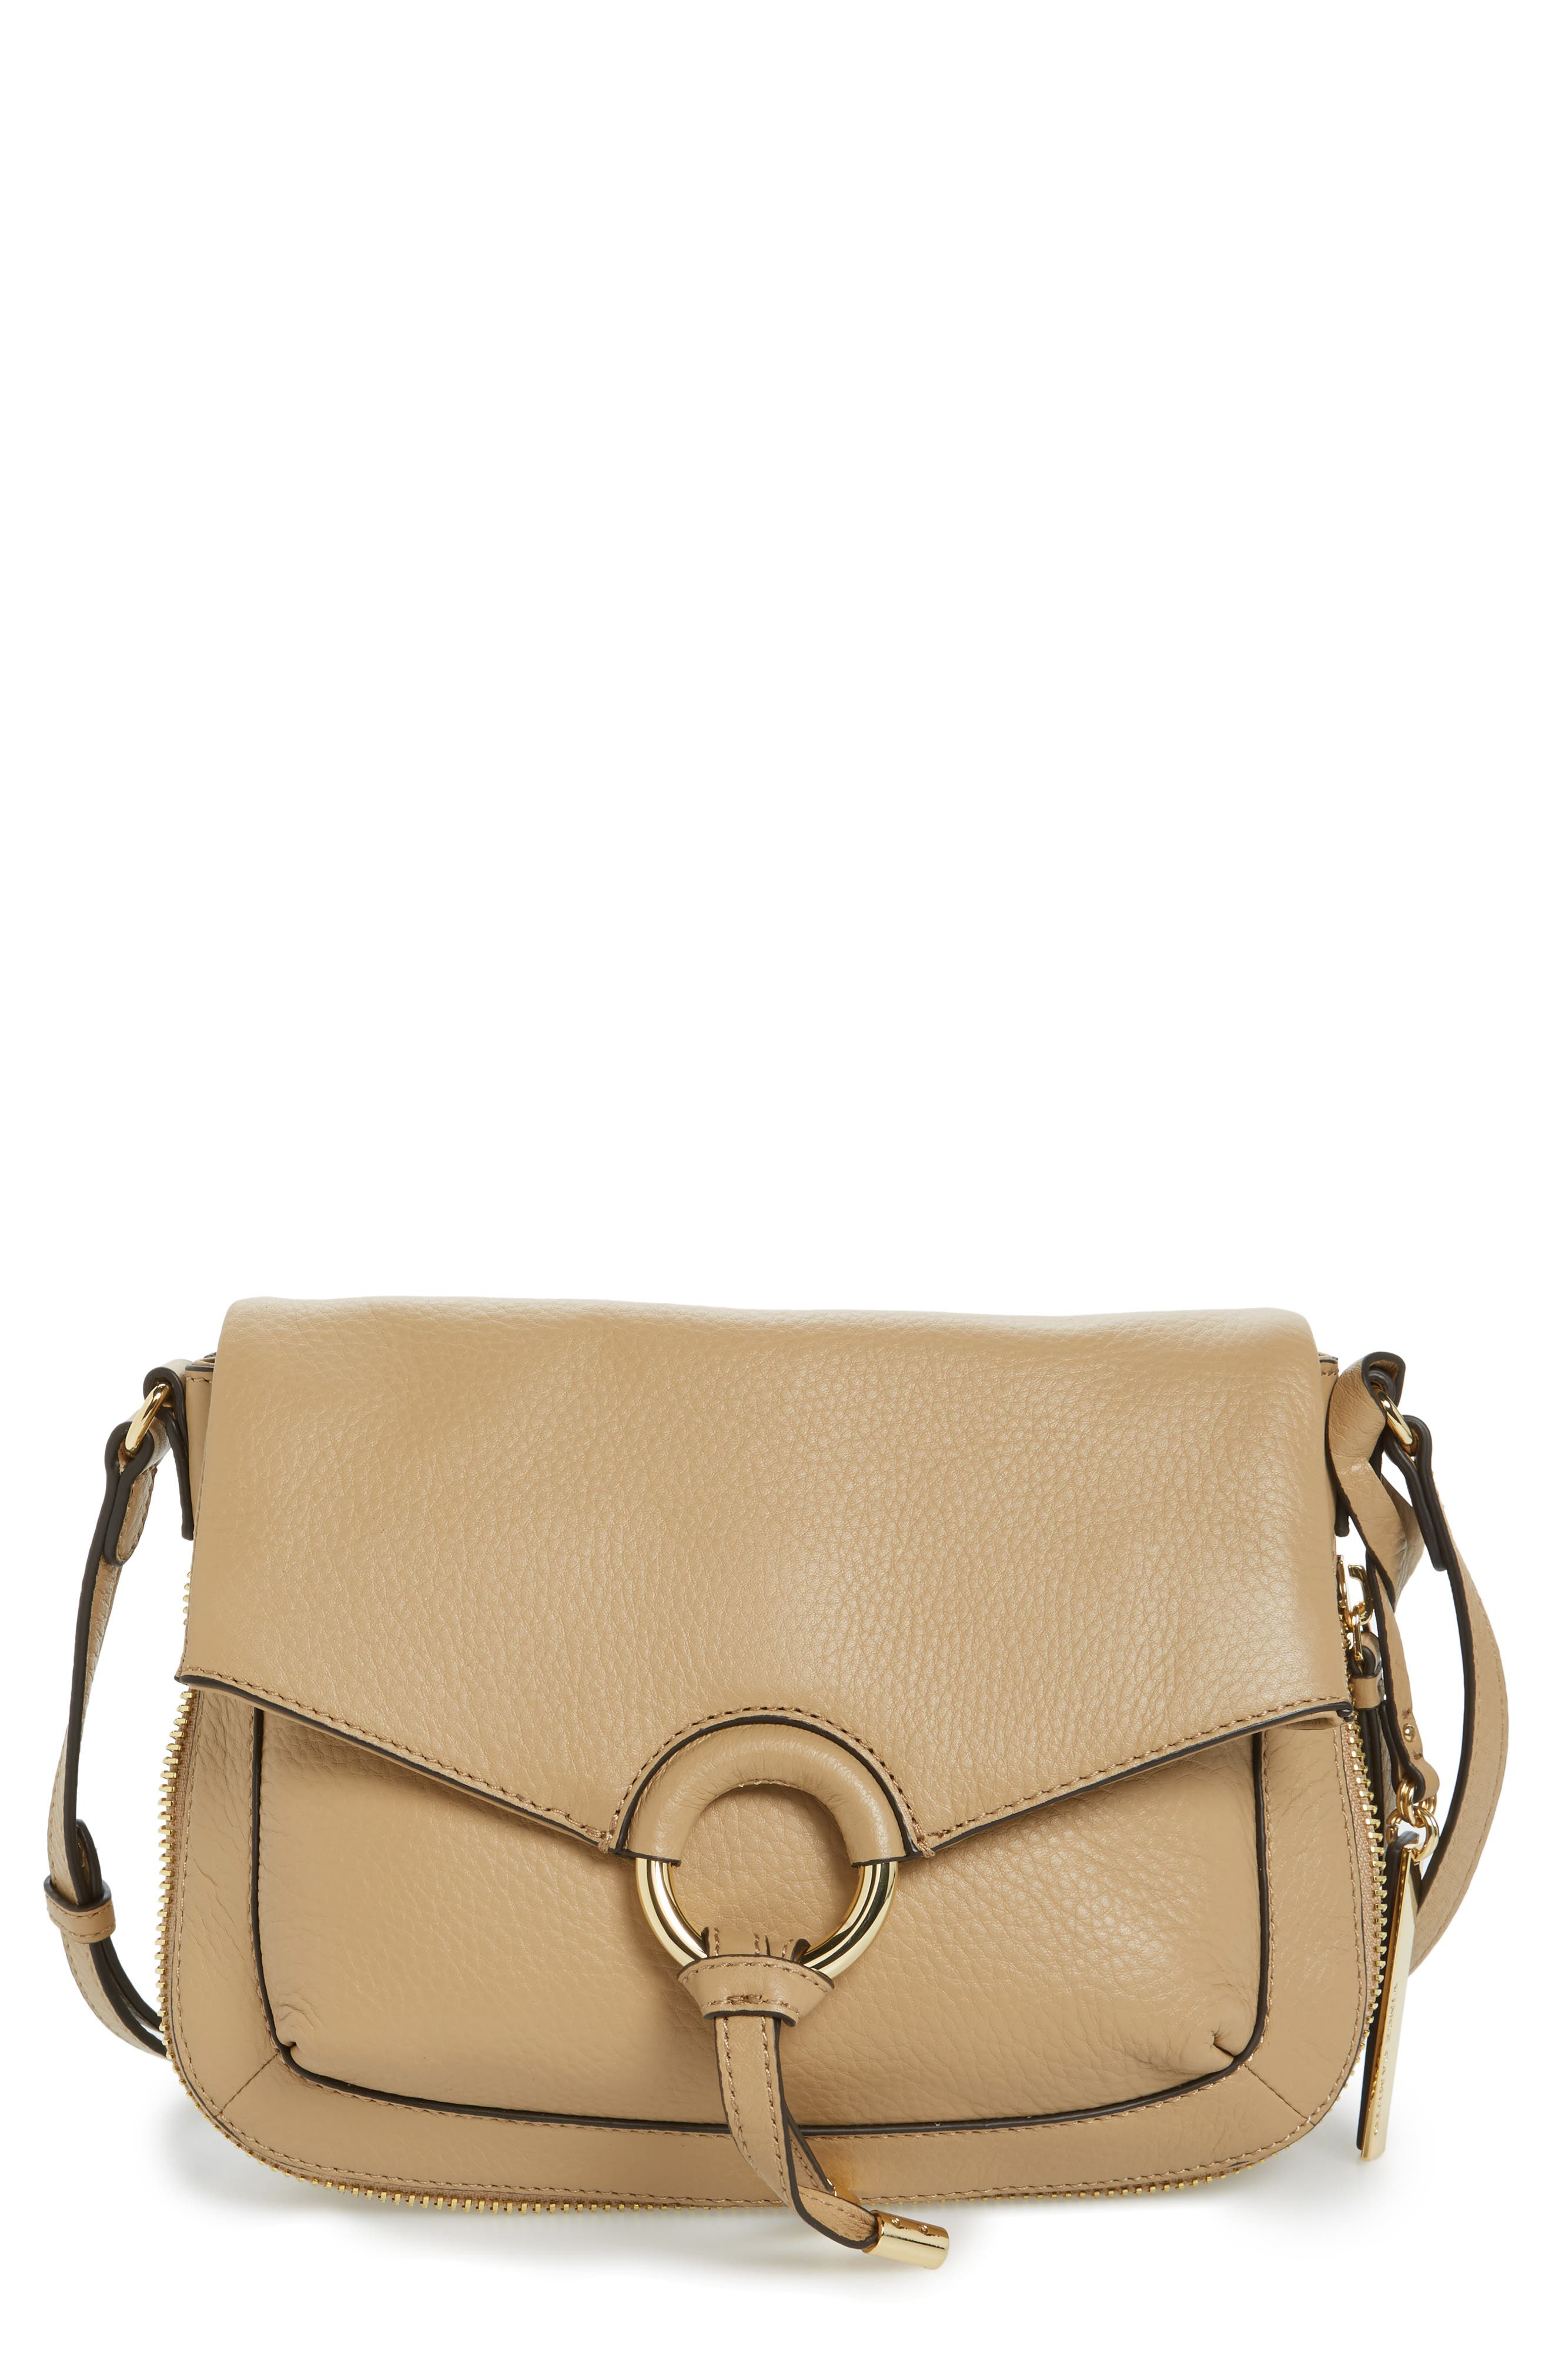 Vince Camuto Adina Leather Crossbody Bag